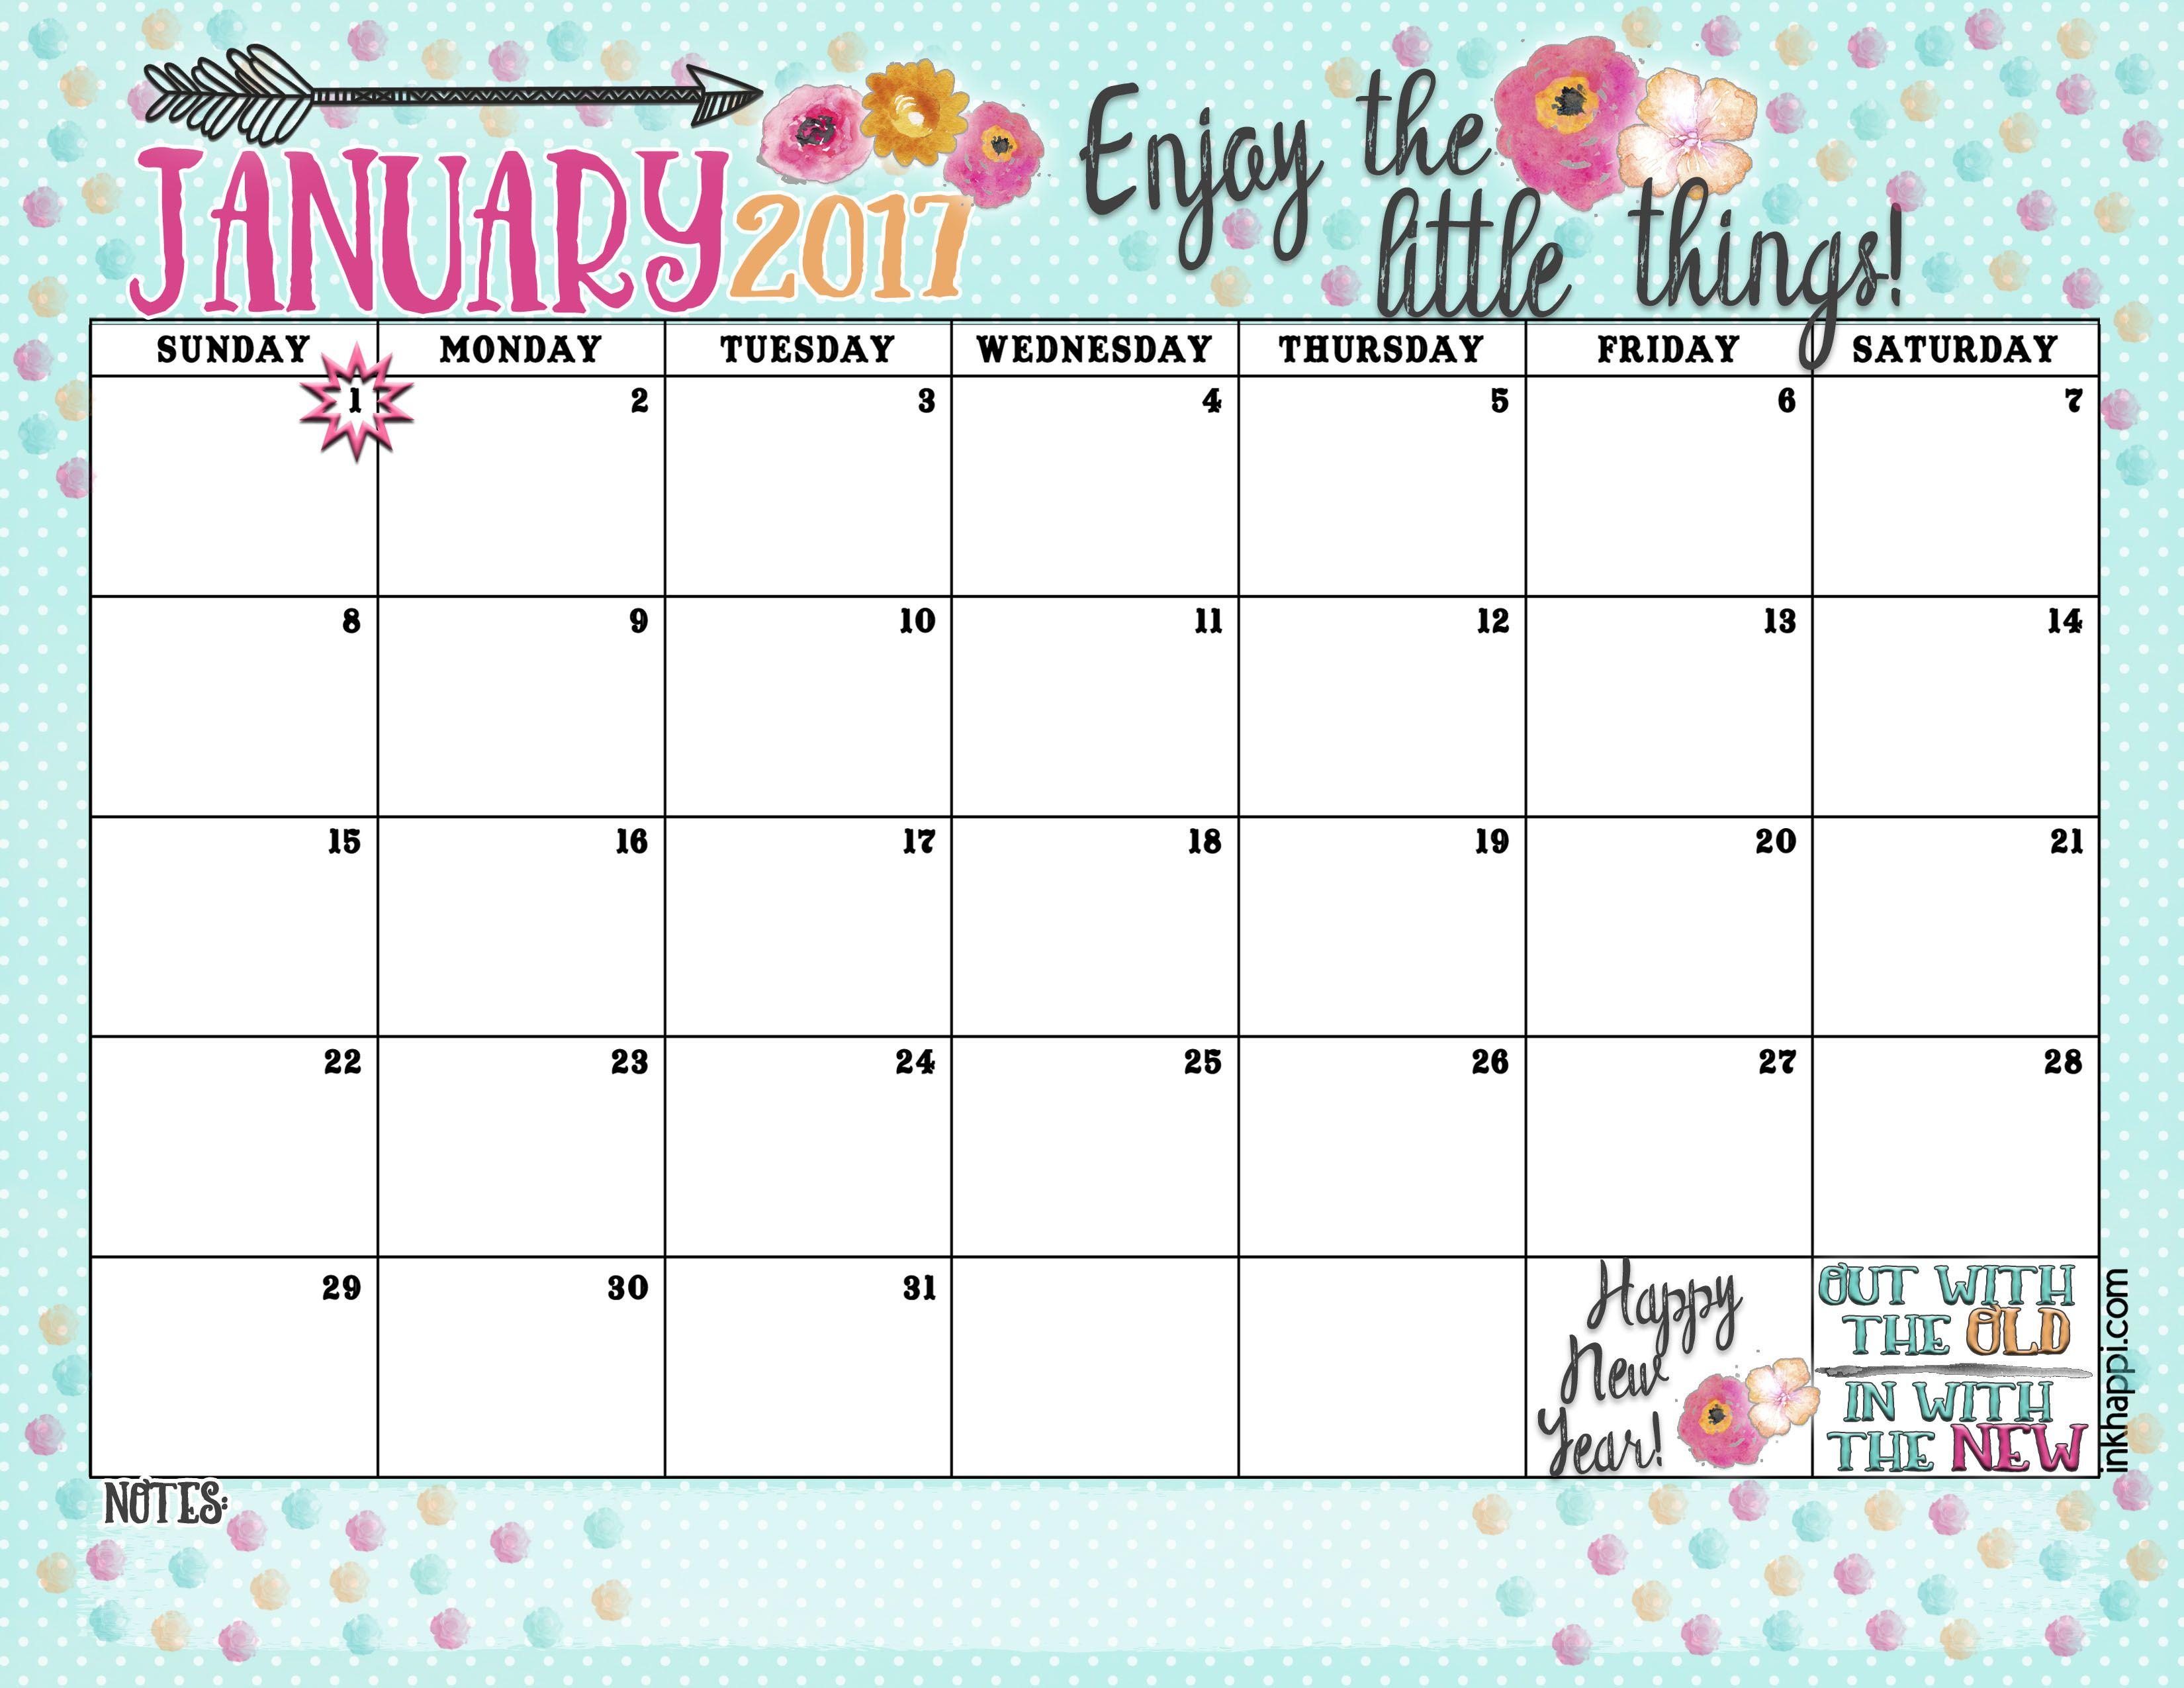 January Calendar Planner : January calendar and print enjoy the little things